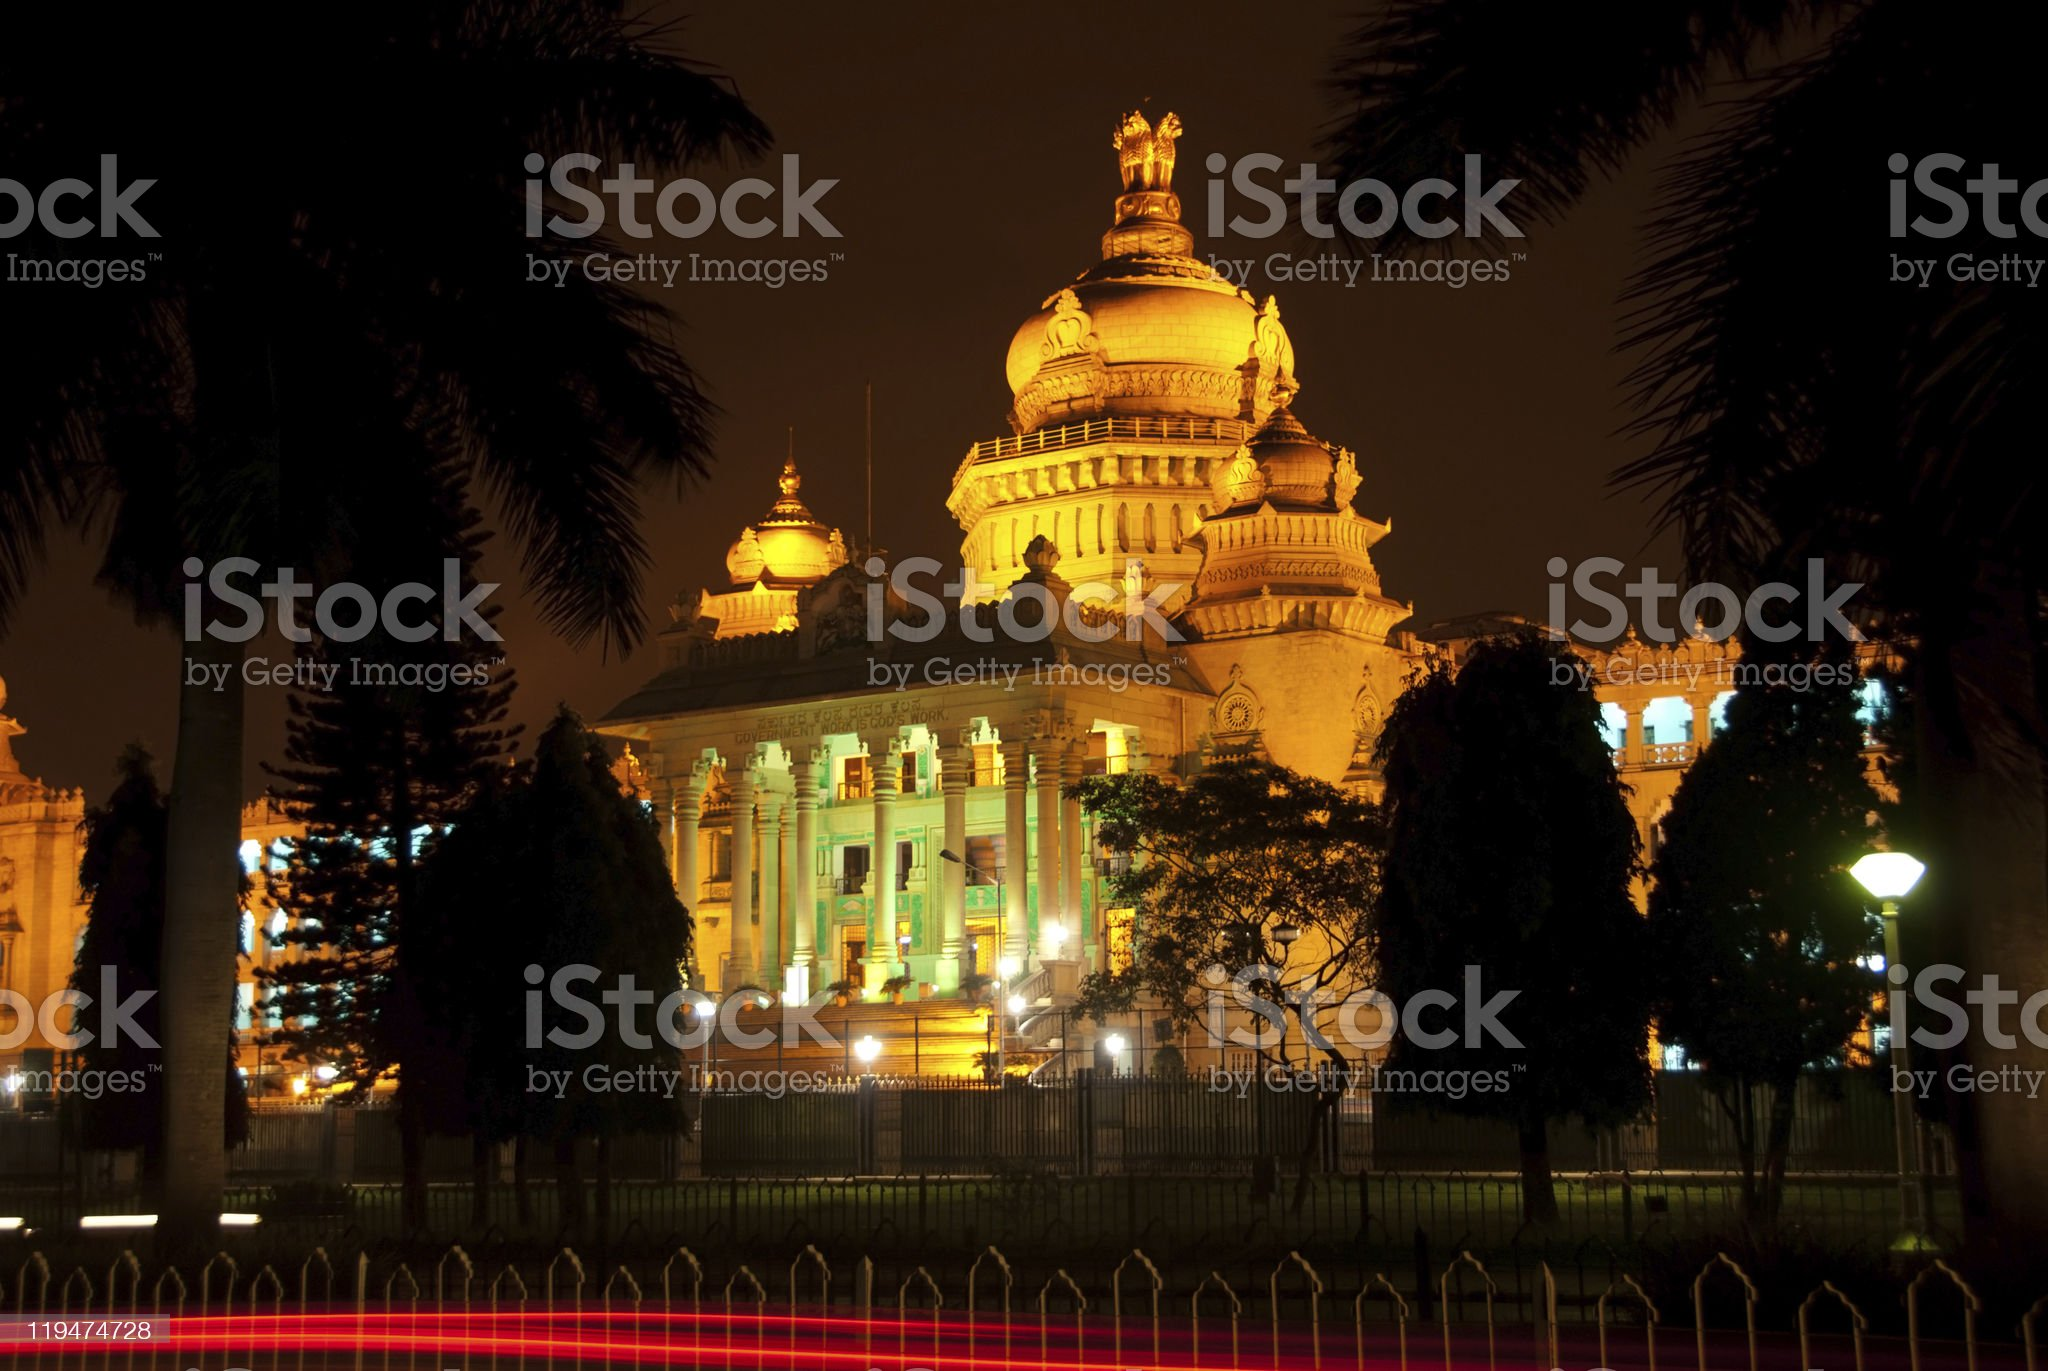 Bangalore at night royalty-free stock photo